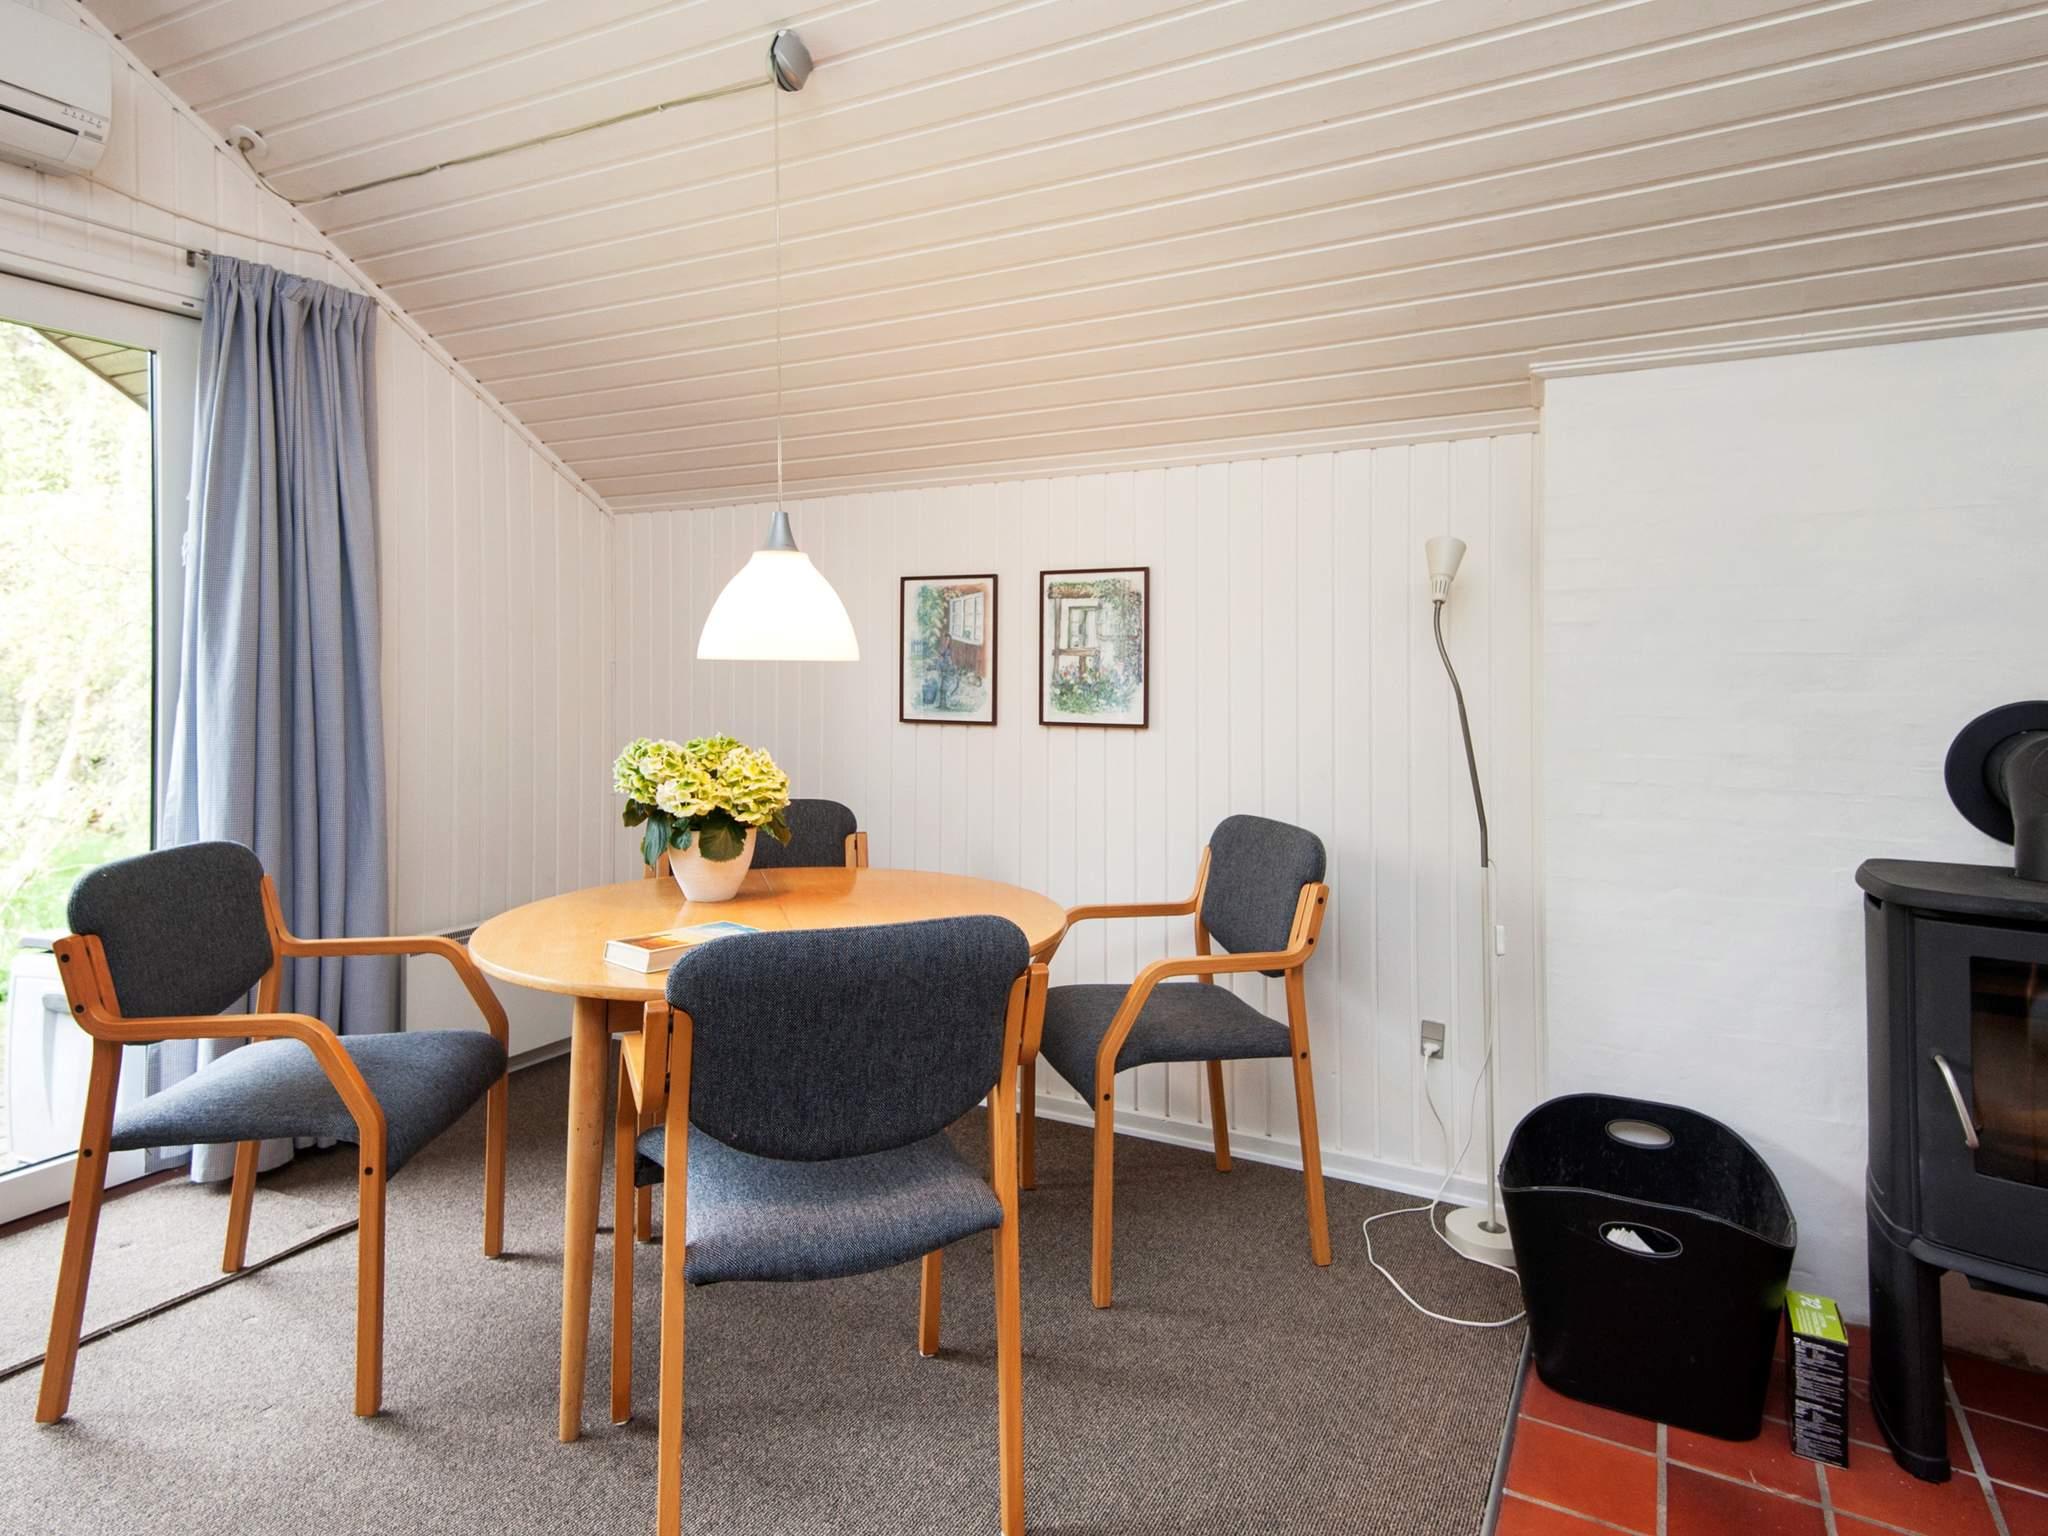 Ferienhaus Ry (83836), Ry, , Ostjütland, Dänemark, Bild 9